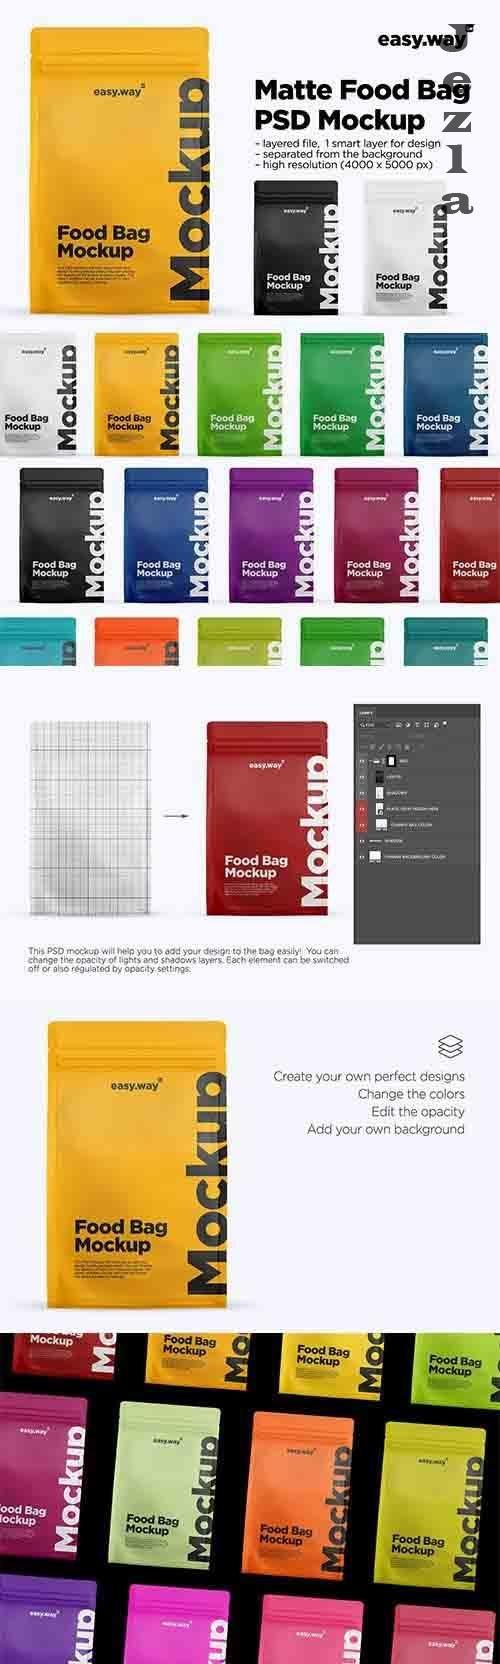 CreativeMarket - Matte Coffee Bag Mockup 5994773